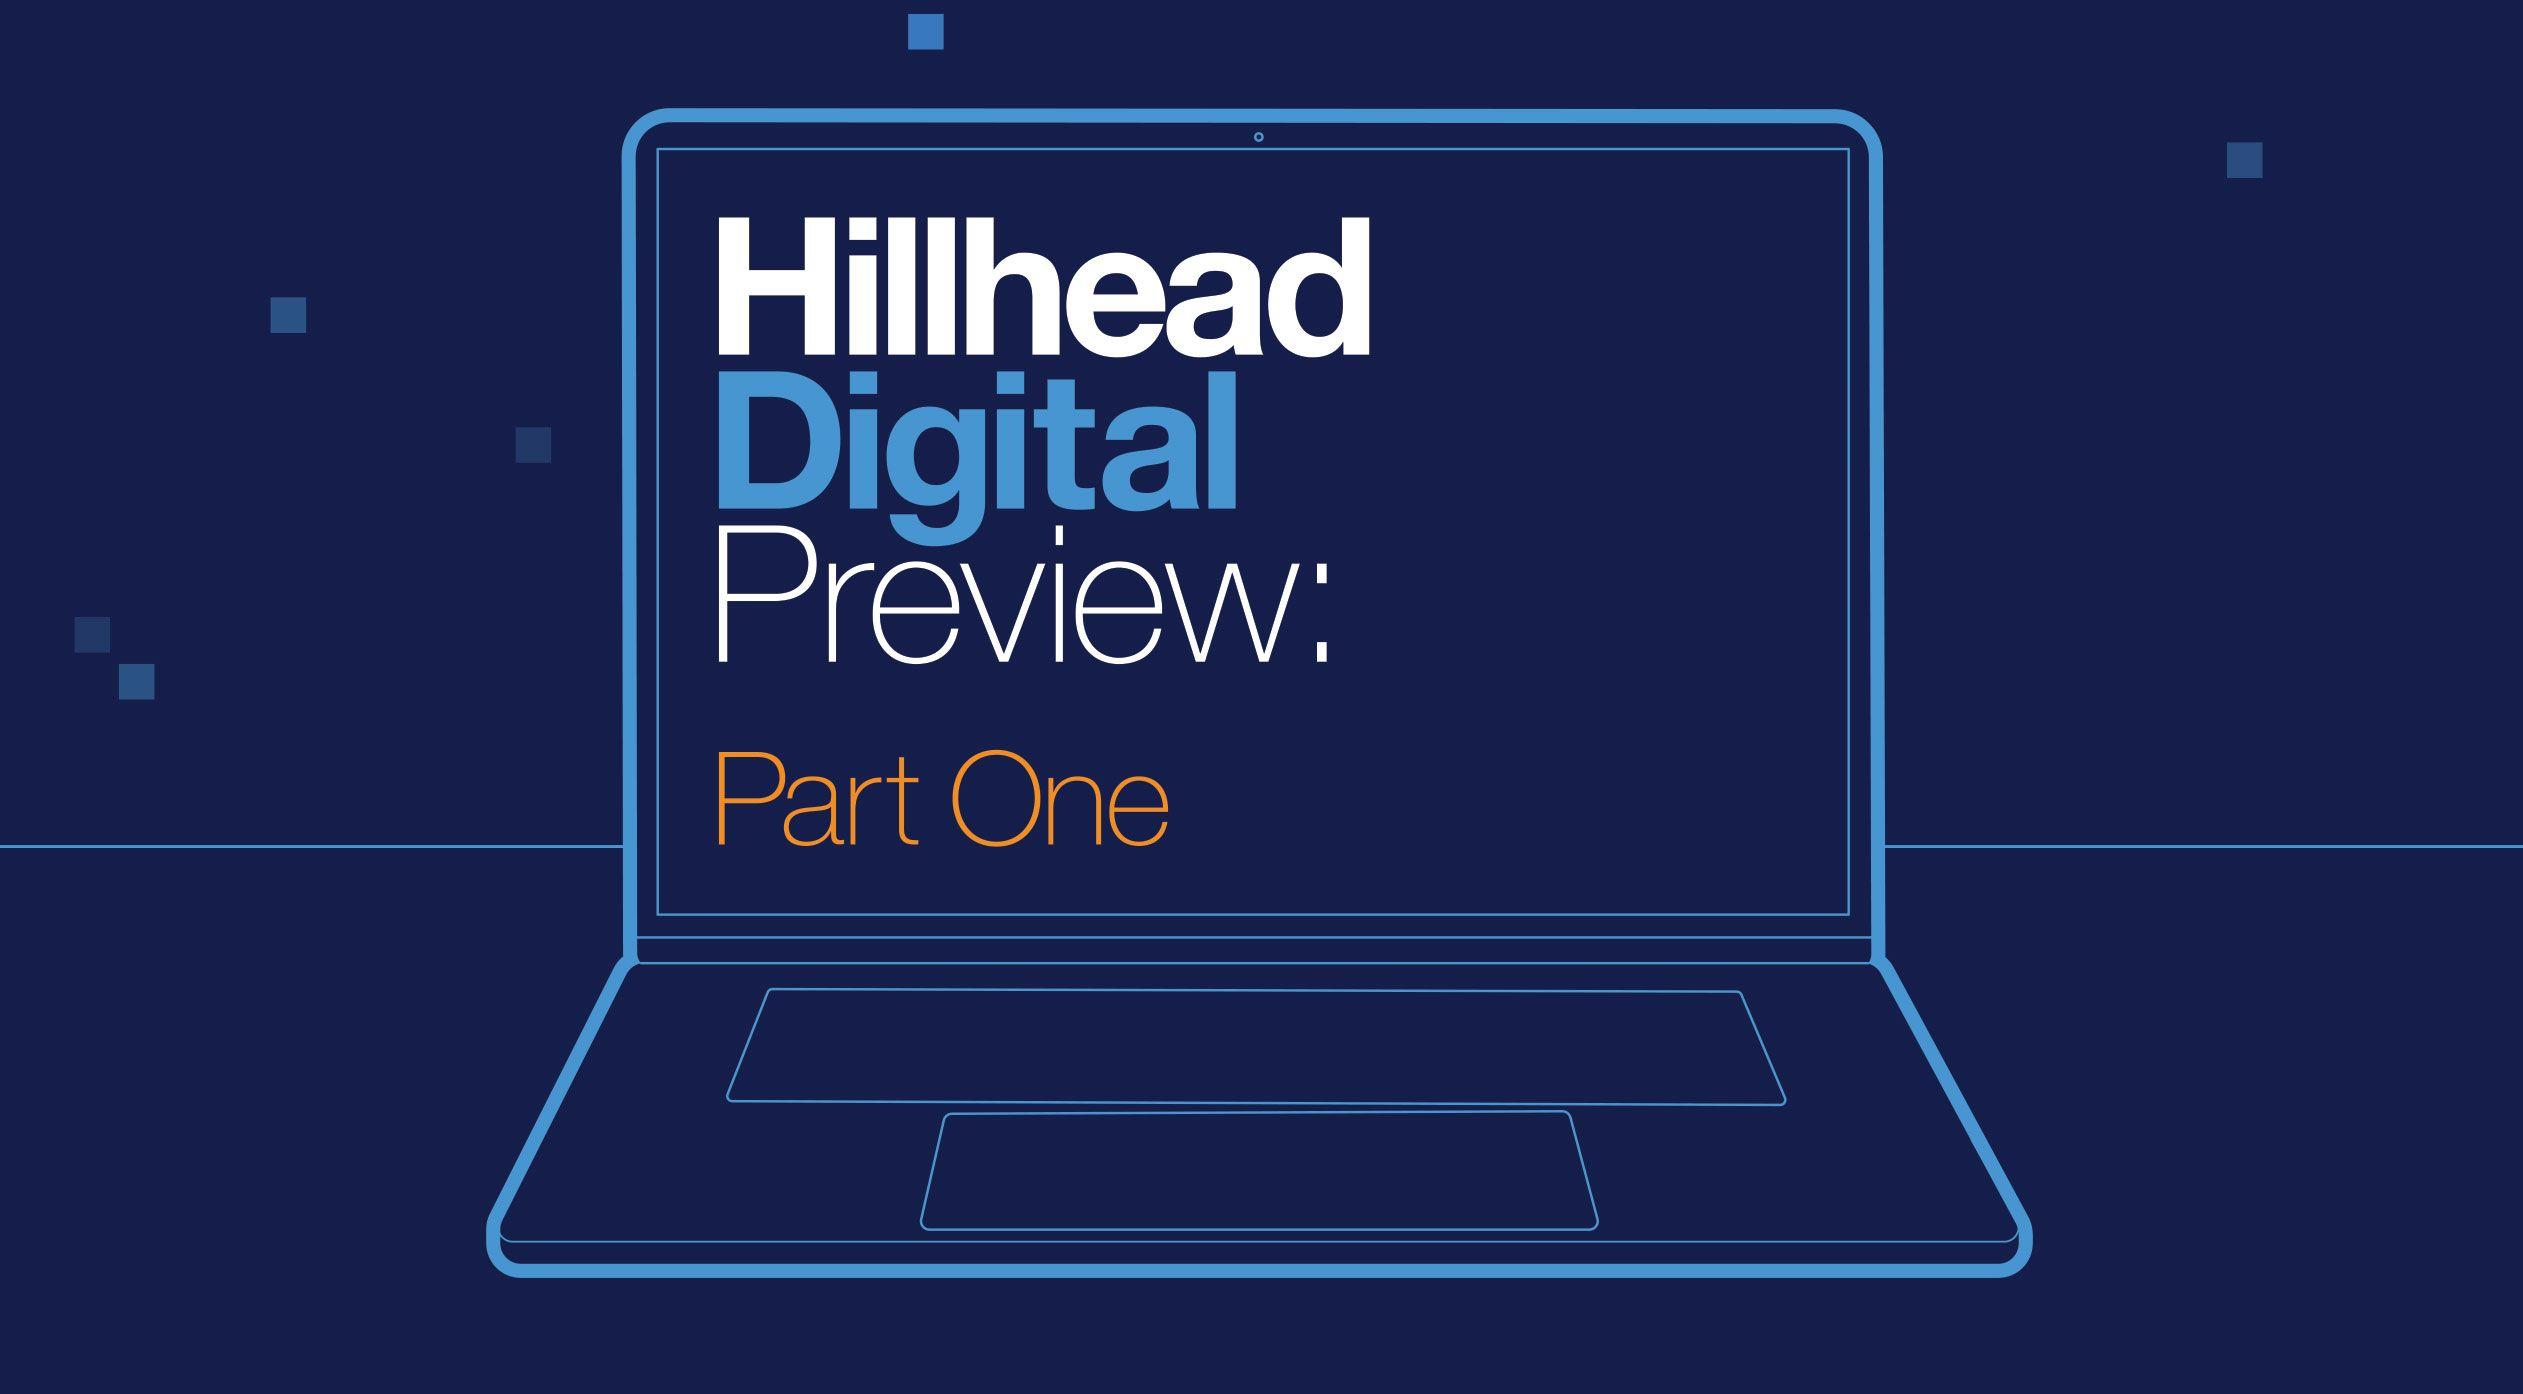 Hillhead Digital Preview Part One